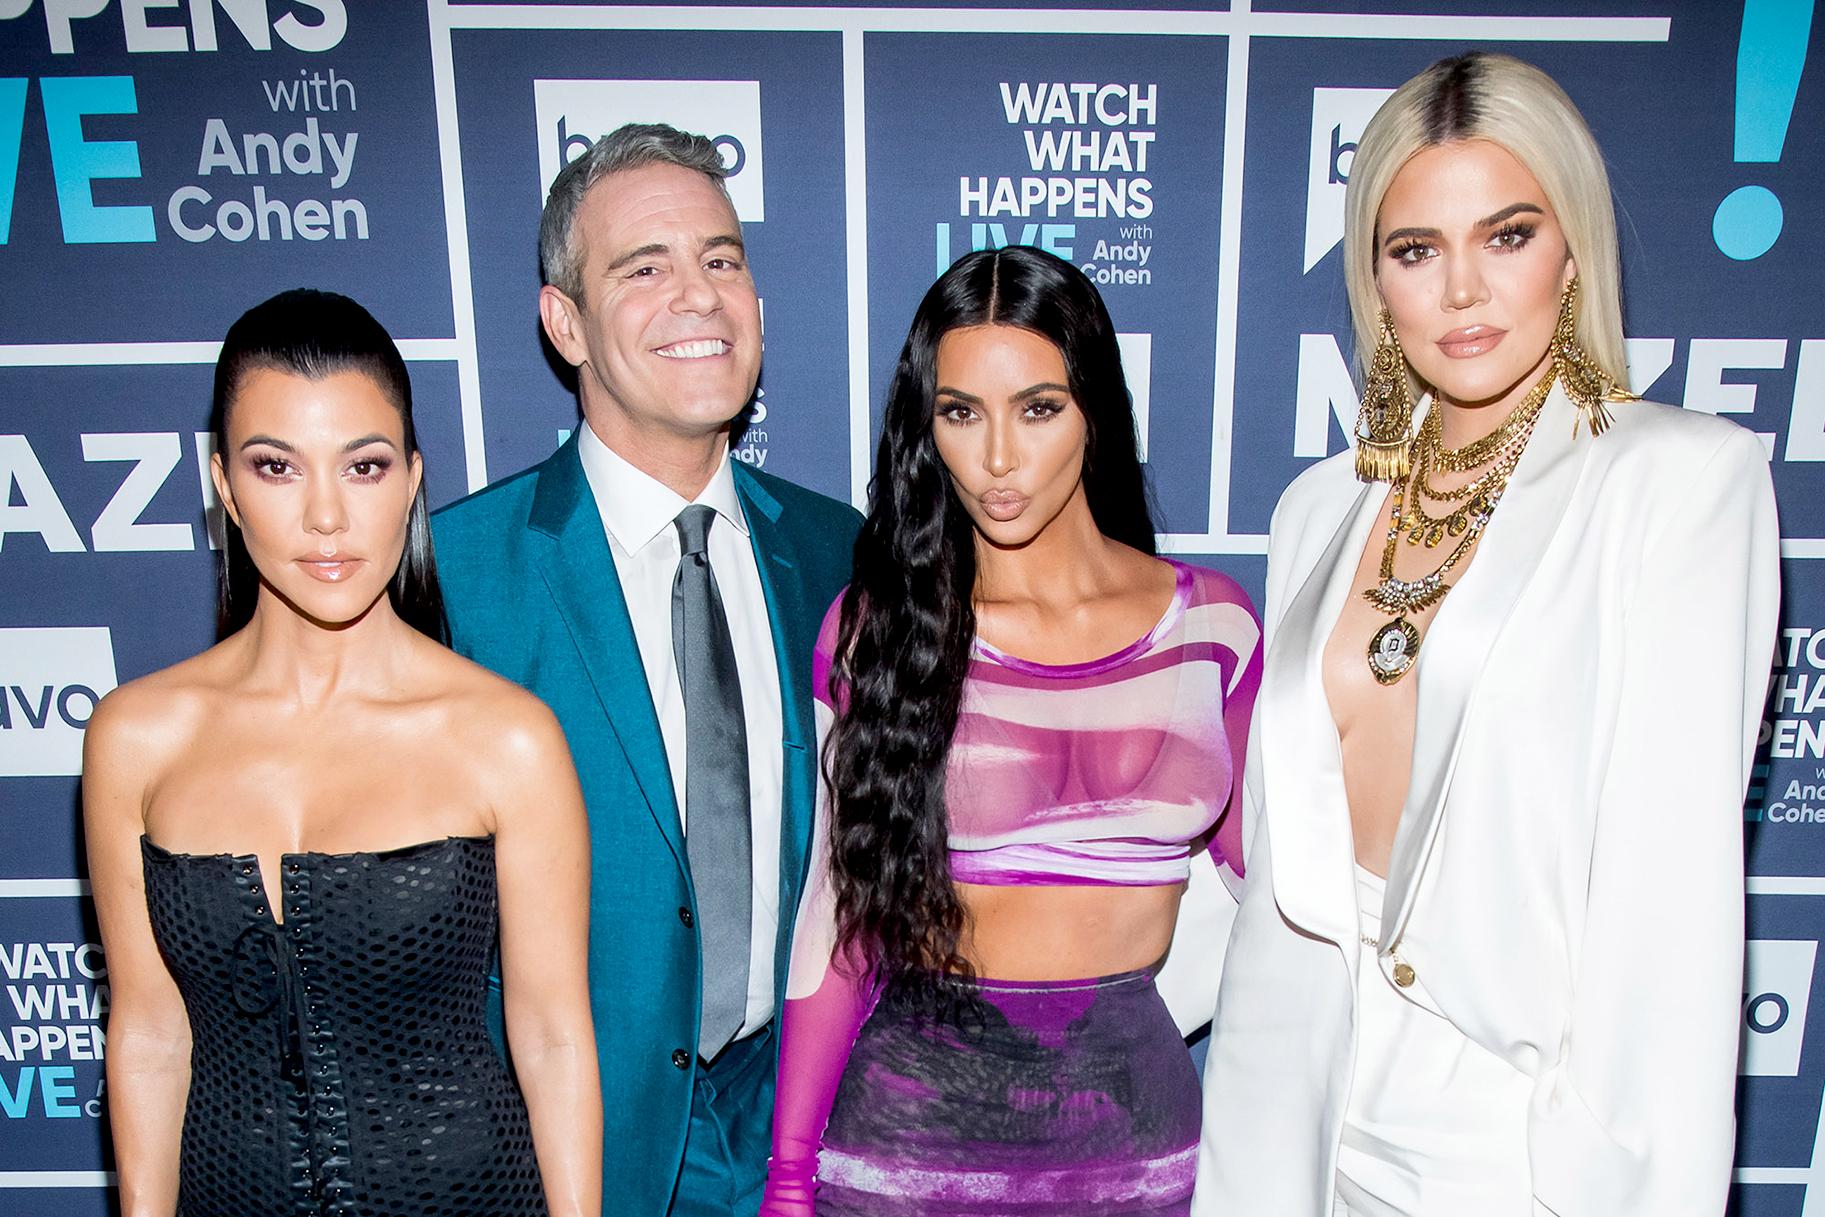 41208a92ea0b5 Kim, Khloe, Kourtney Kardashian: Parenting Advice Andy Cohen | Personal  Space